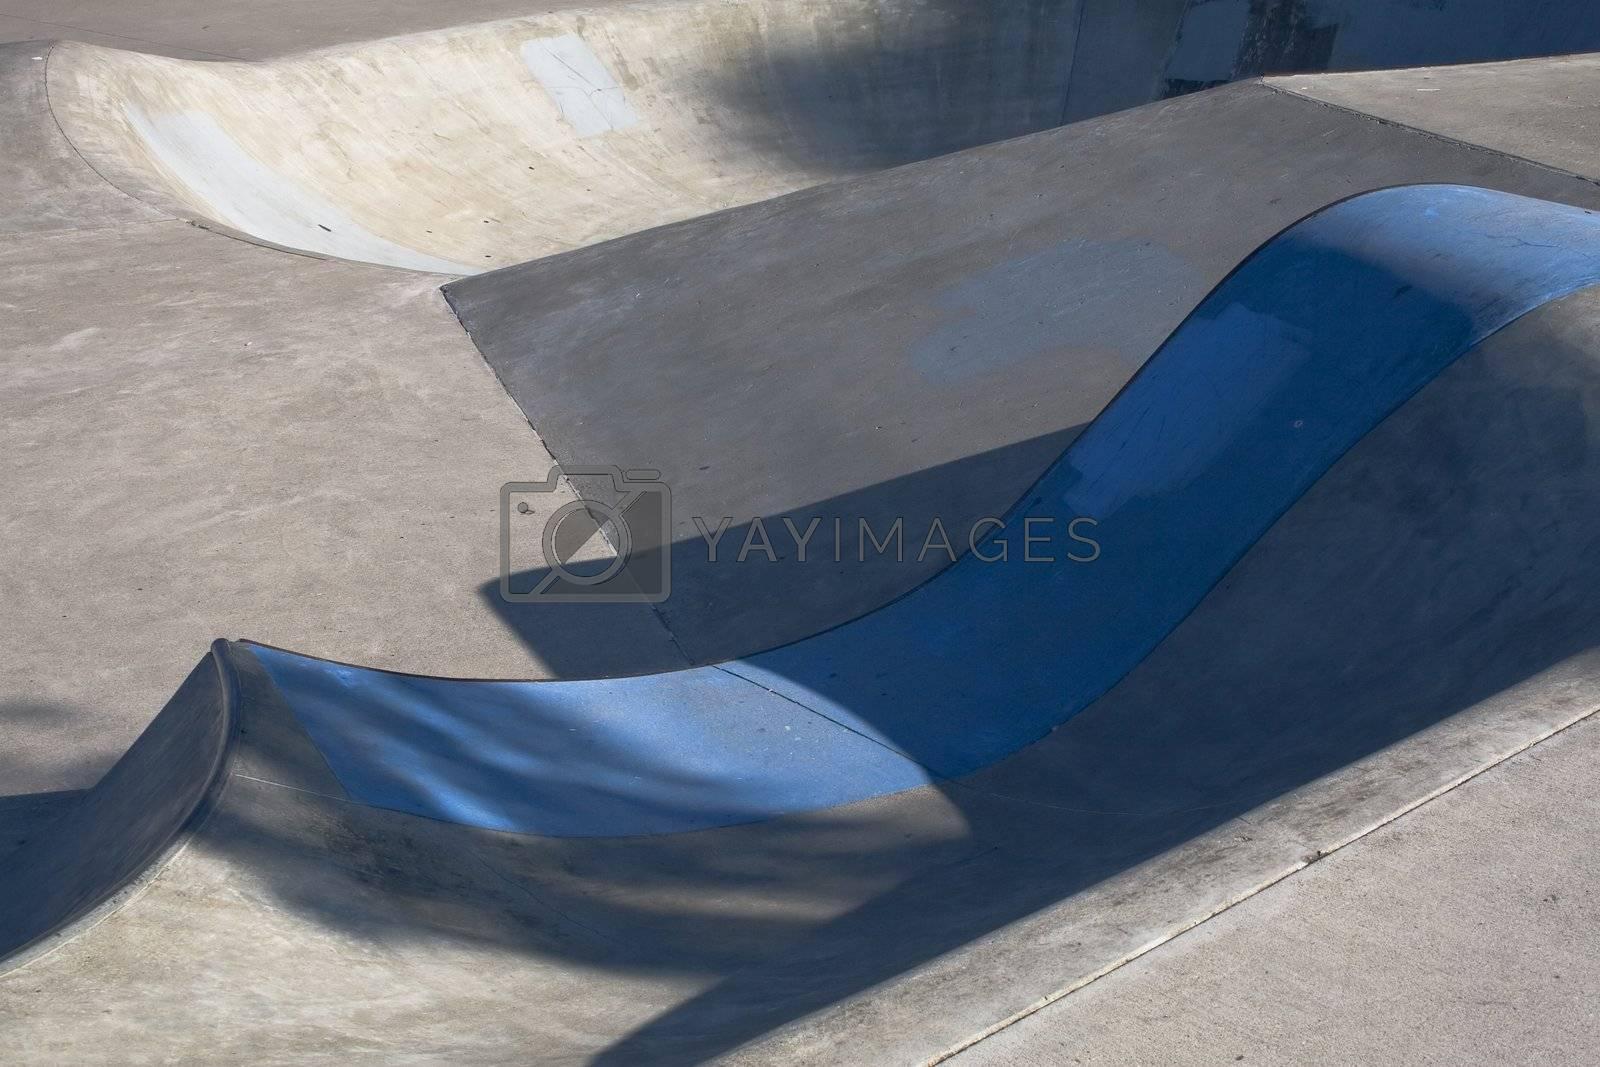 A skateboard park bowl with a blue painted concrete lip.